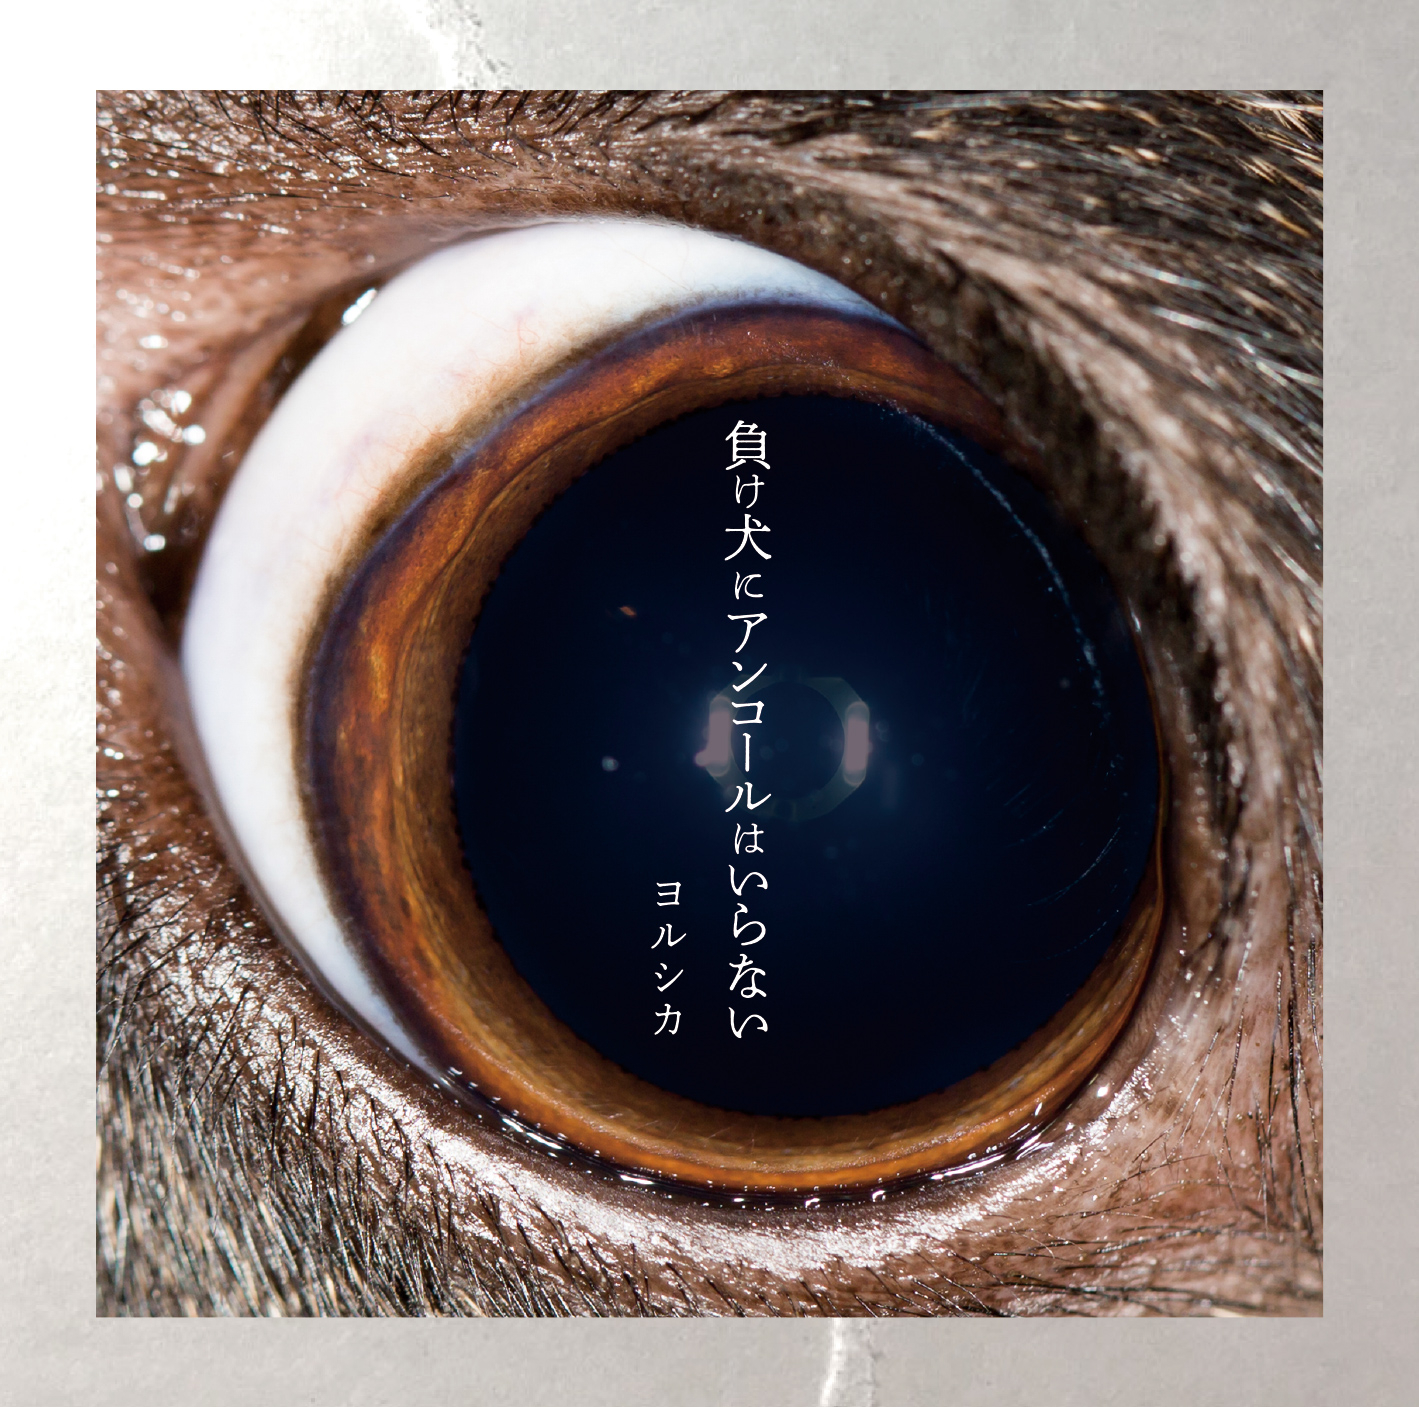 【ALBUM】2nd Mini Album「負け犬にアンコールはいらない」